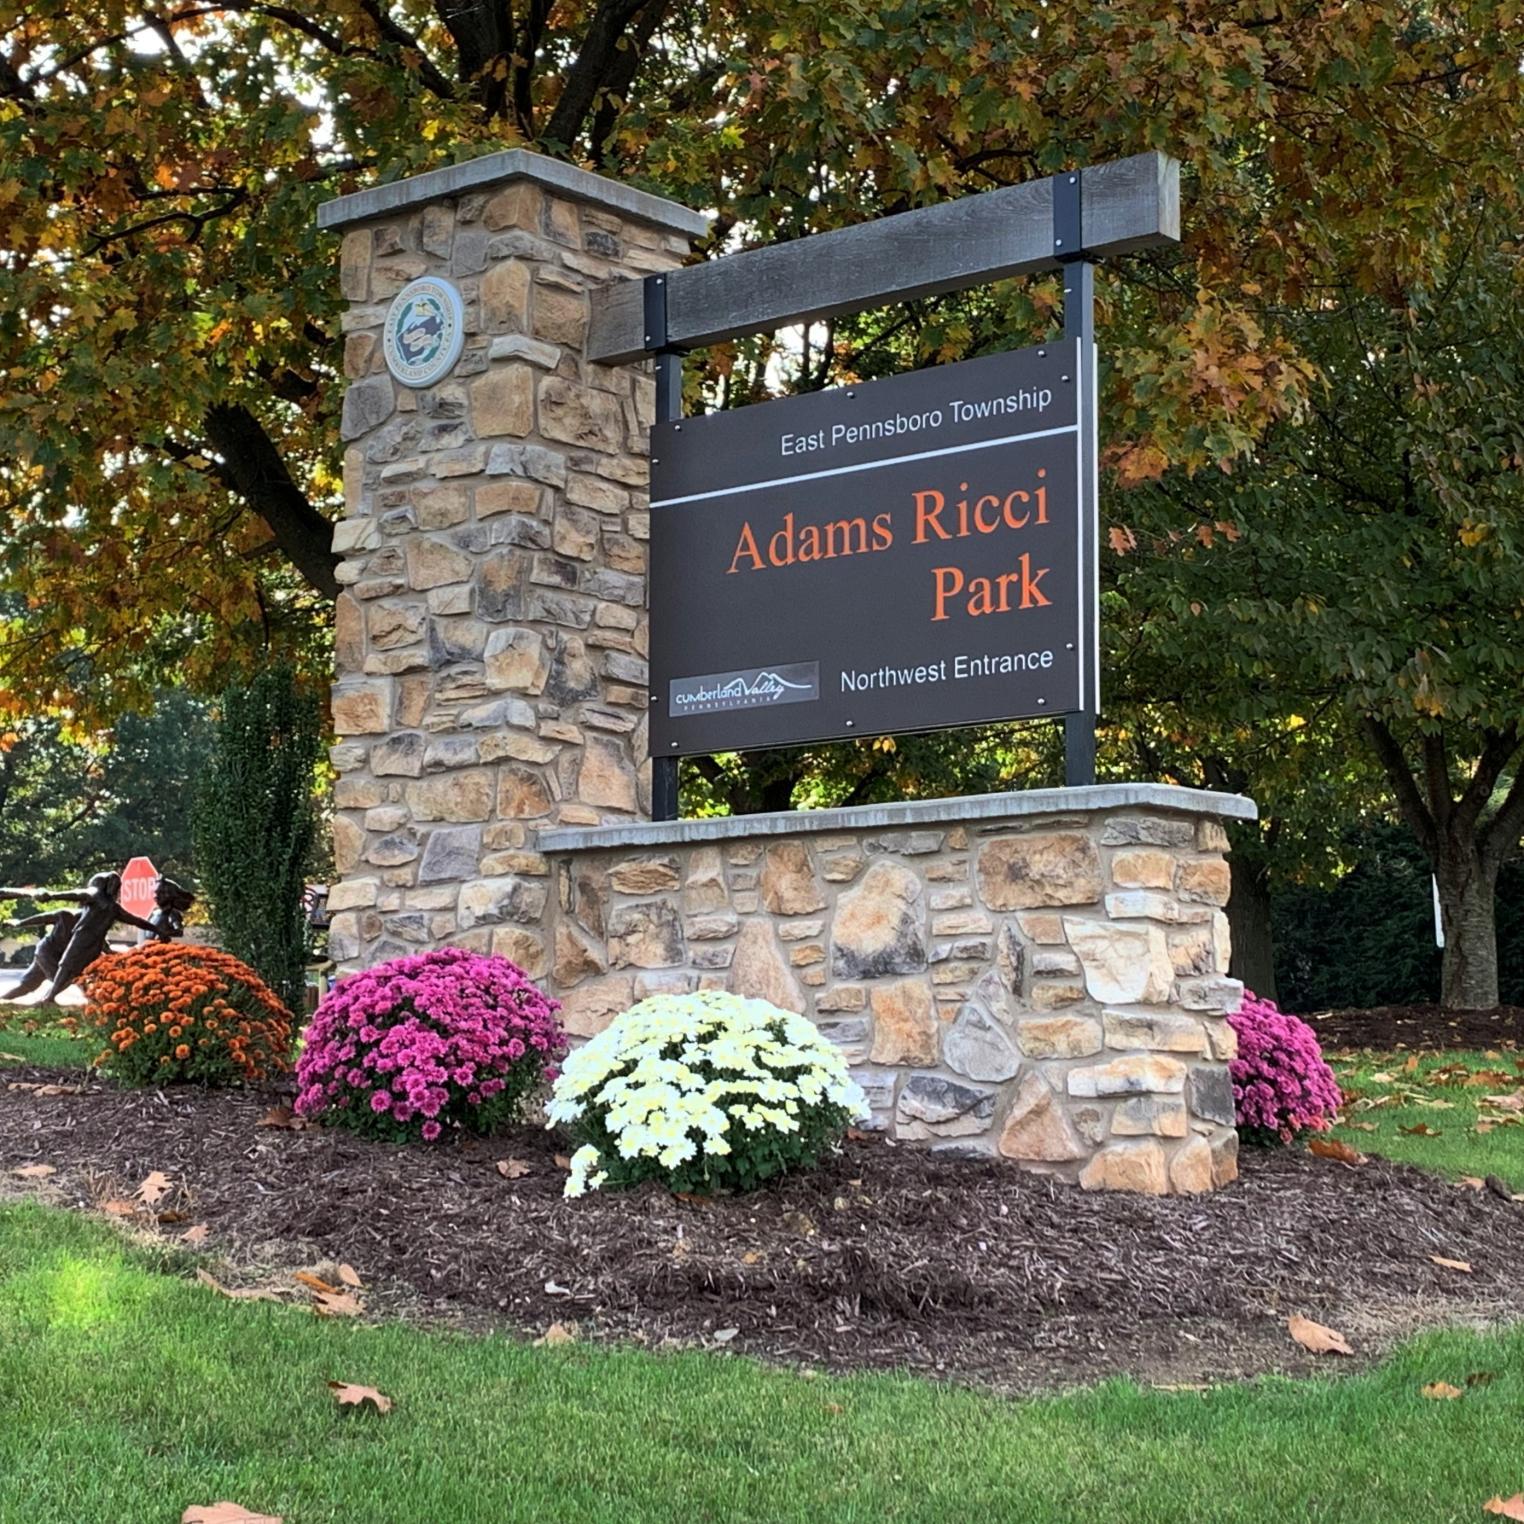 Adams-Ricci Park